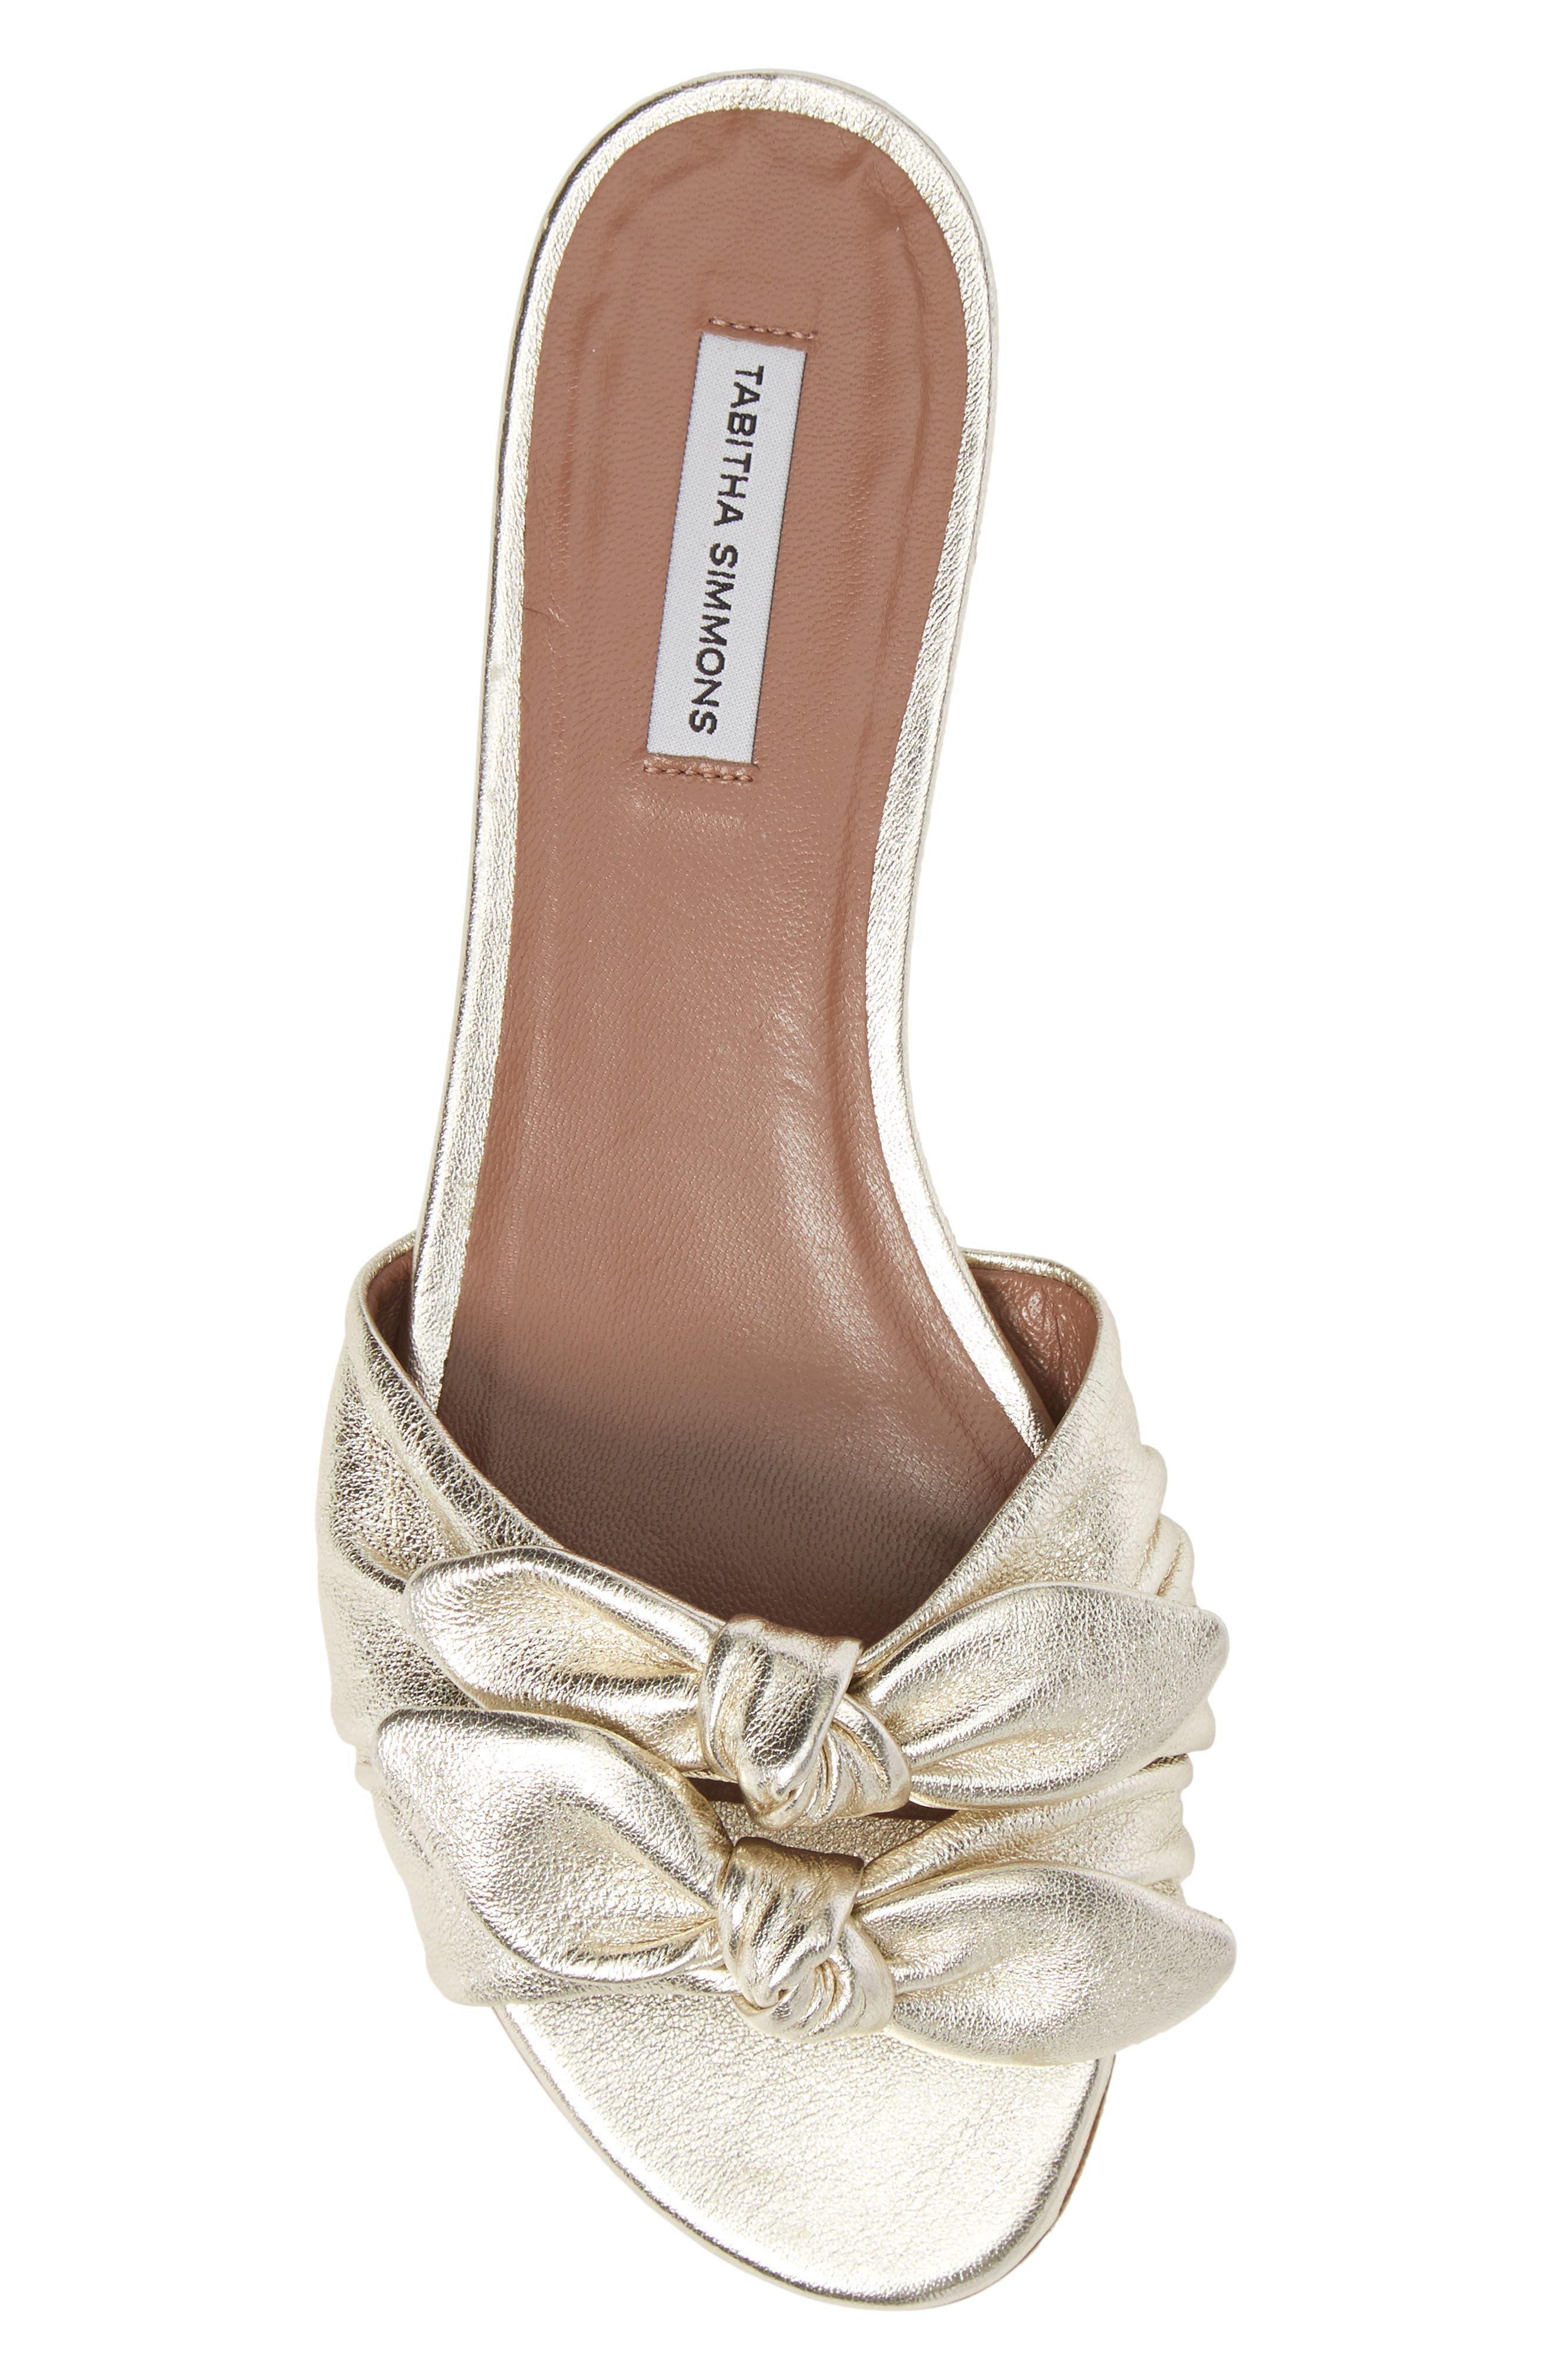 Cleo Knotted Bow Slide Sandal,                             Alternate thumbnail 5, color,                             040